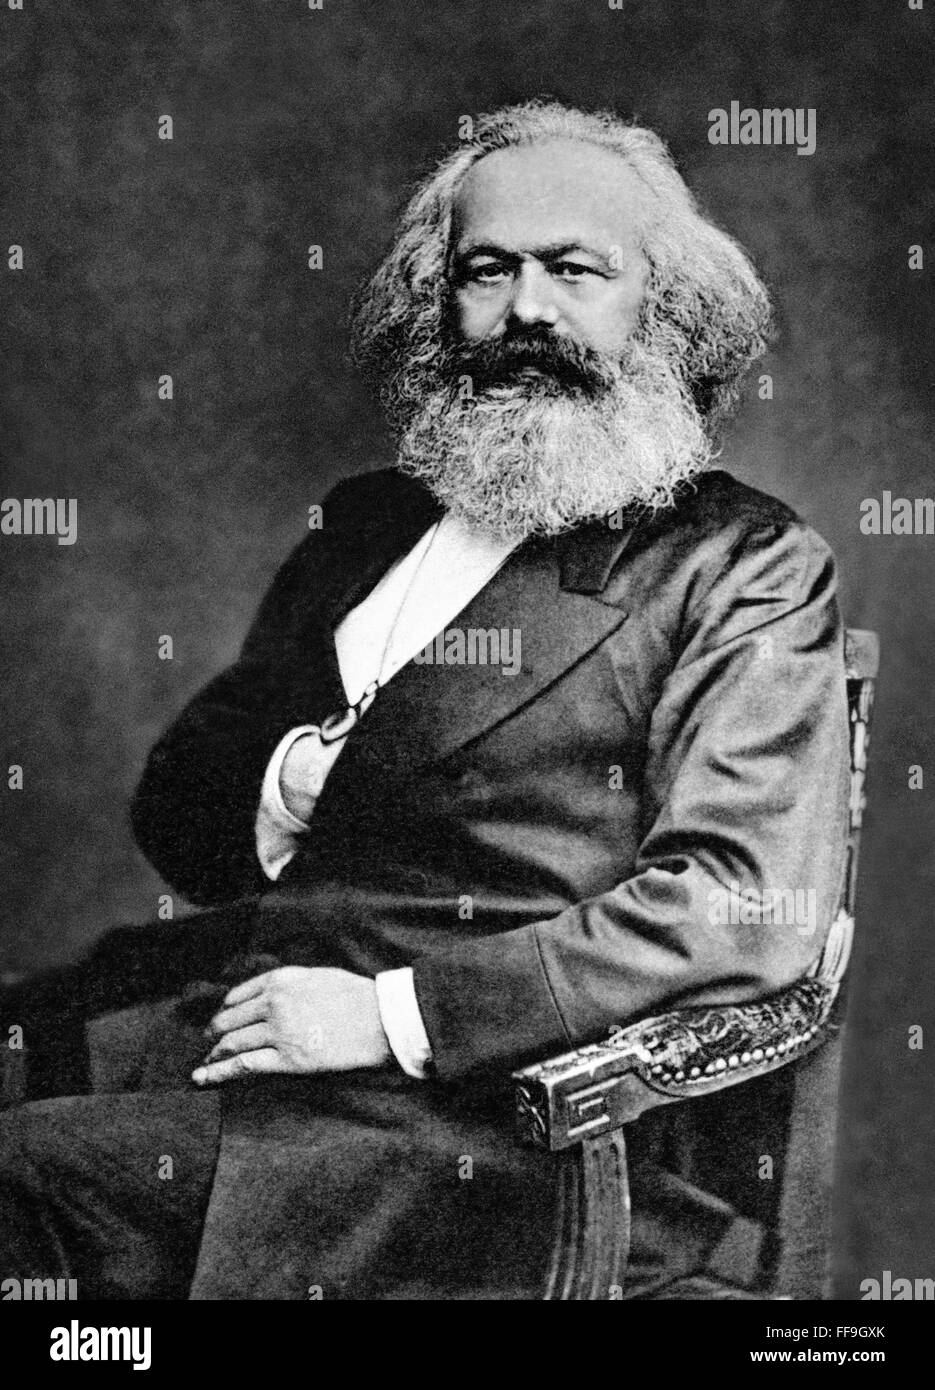 Karl Marx, the German born socialist philosopher, economist and writer. Photo c.1875 - Stock Image